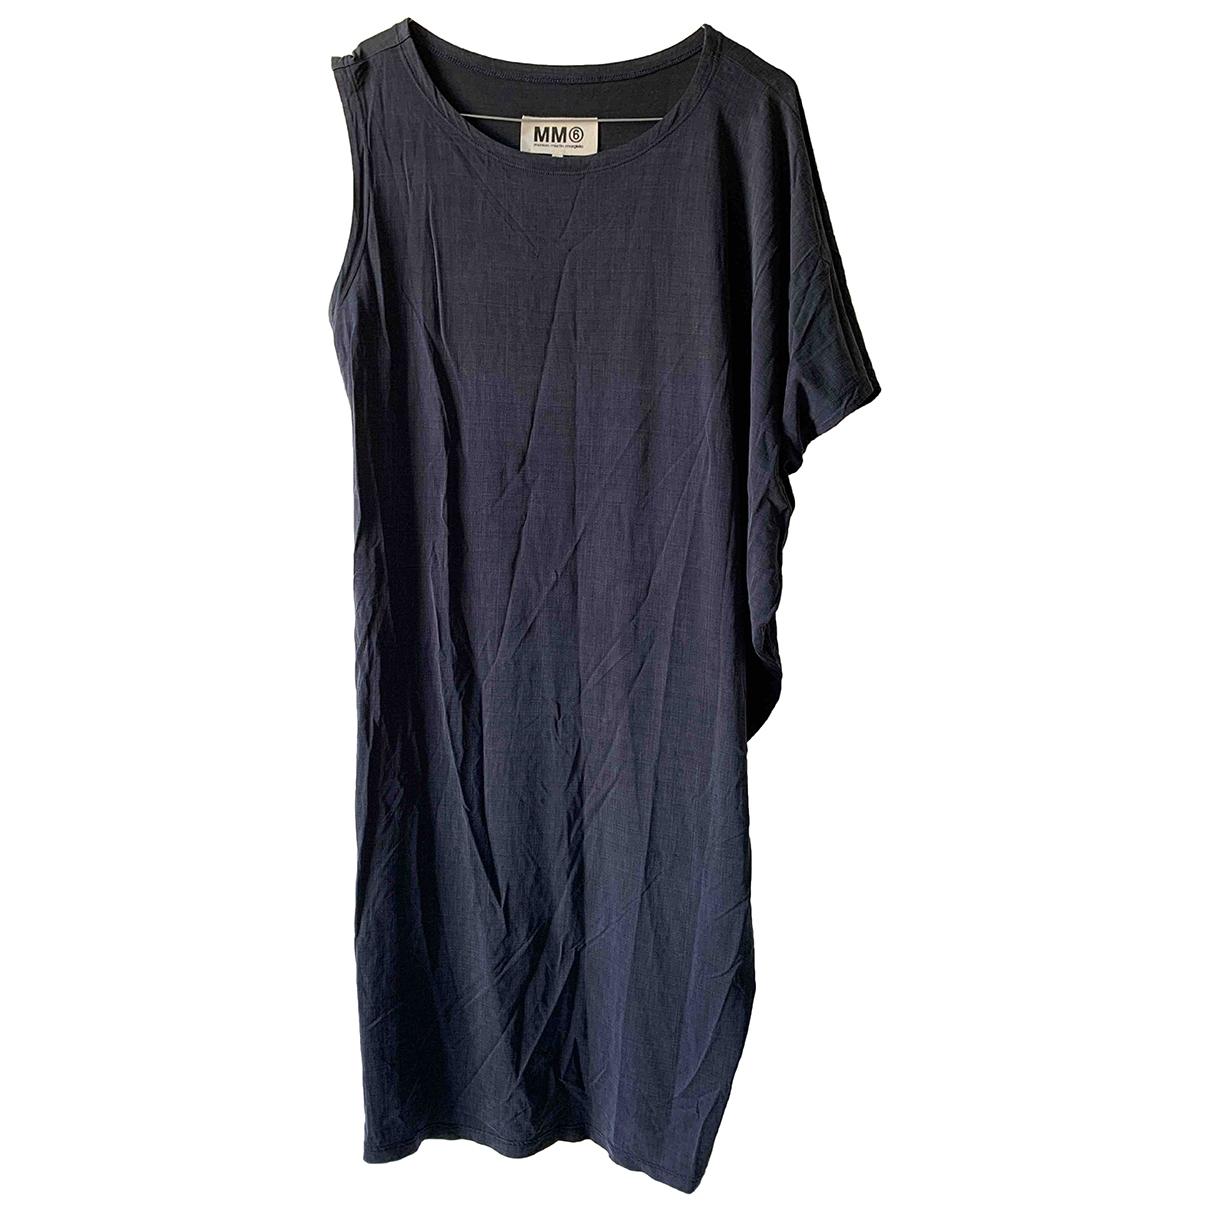 Mm6 \N Blue dress for Women M International